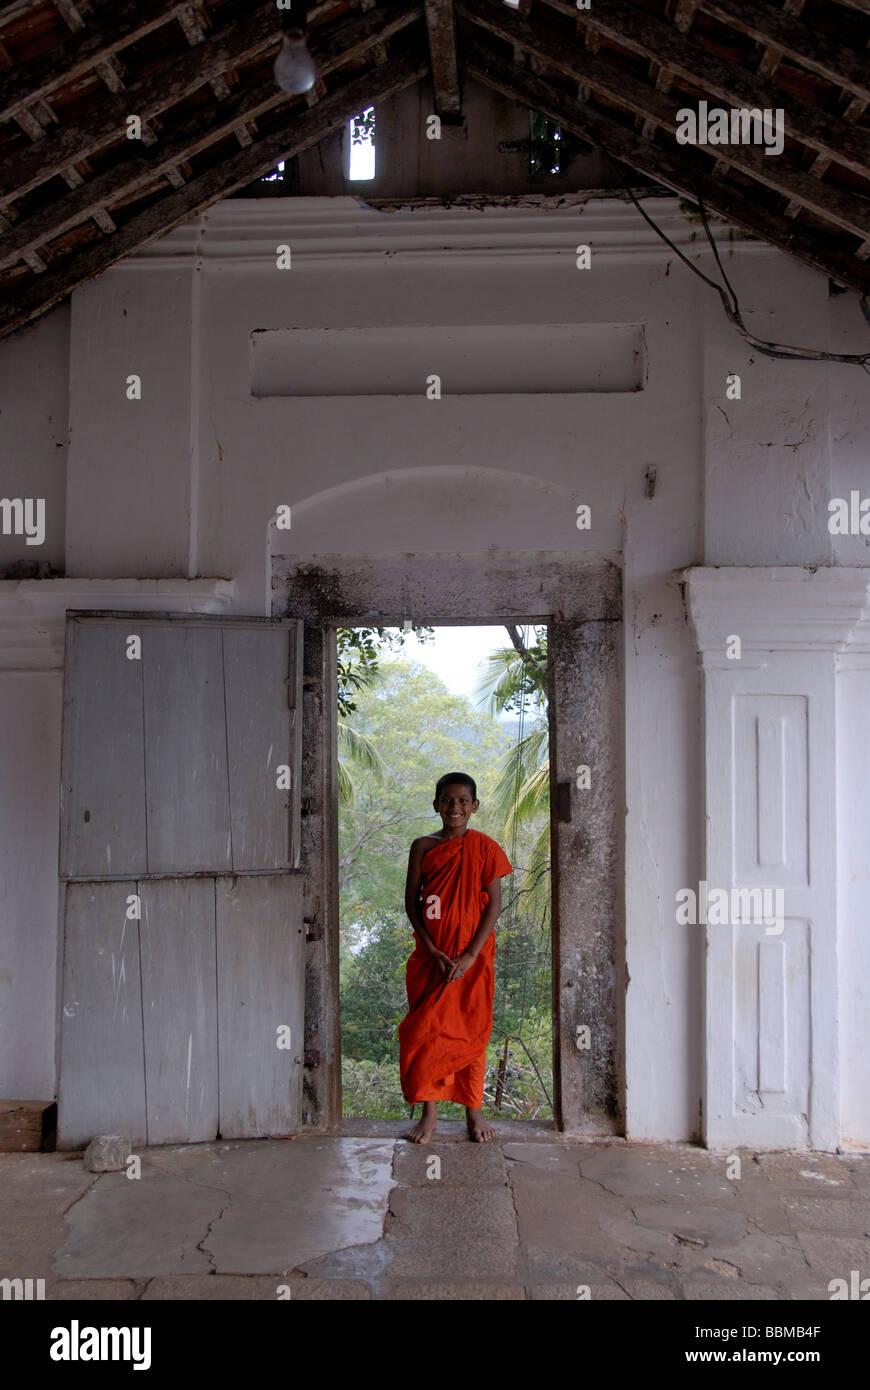 Buddhismus, ein Neuling in einem roten Gewand steht im Eingangsbereich, Mulgirigala Tempel, Mulkirigala Vihara, Stockbild